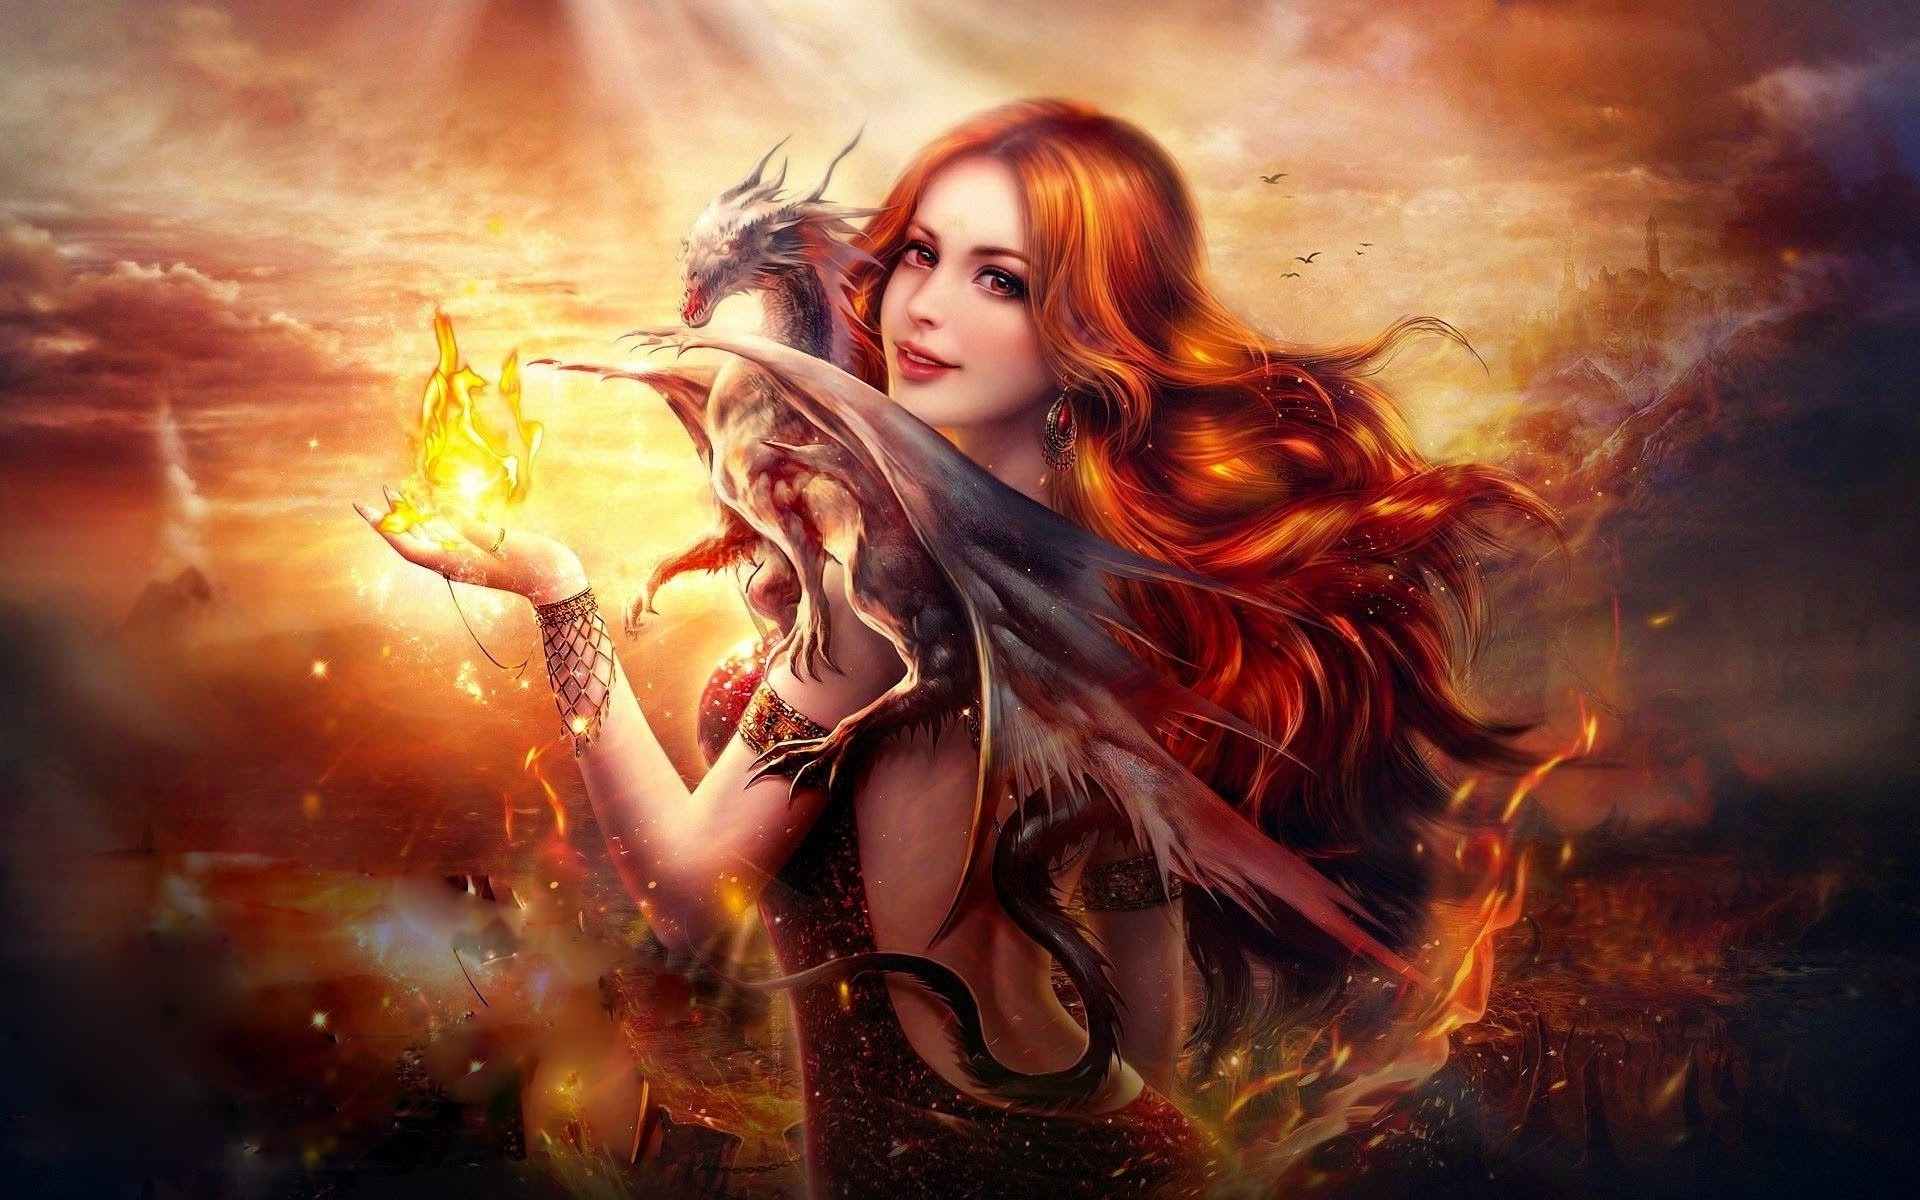 dragon_fire_fantasy_girl-1920x1200